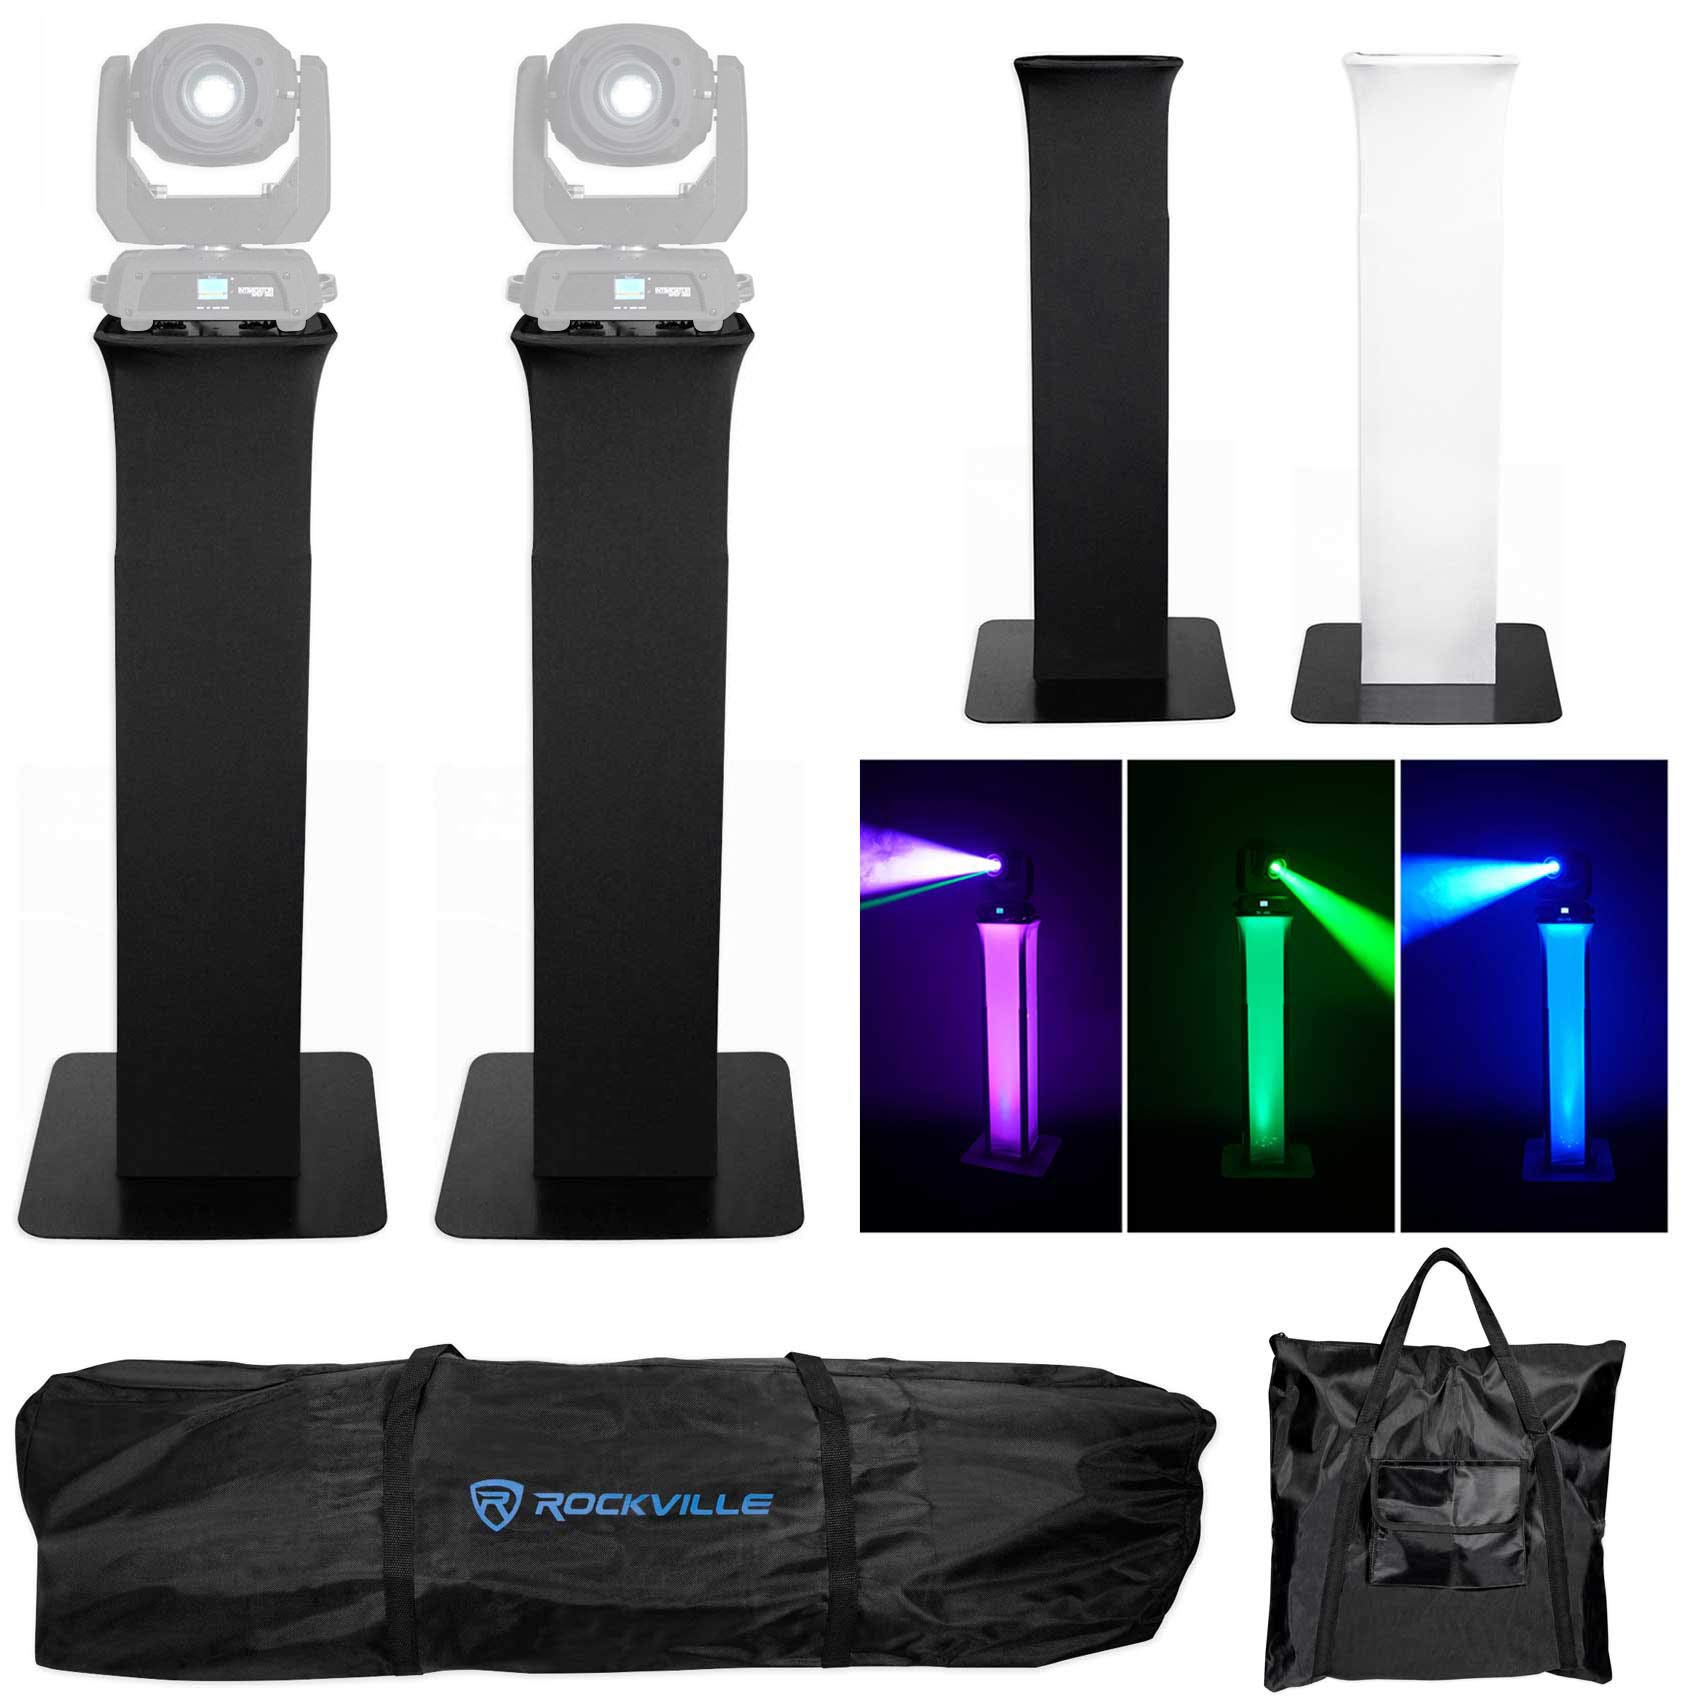 2) Rockville RTP32B Totem Moving Head Light Stands+Black+White Scrims+Carry Bags